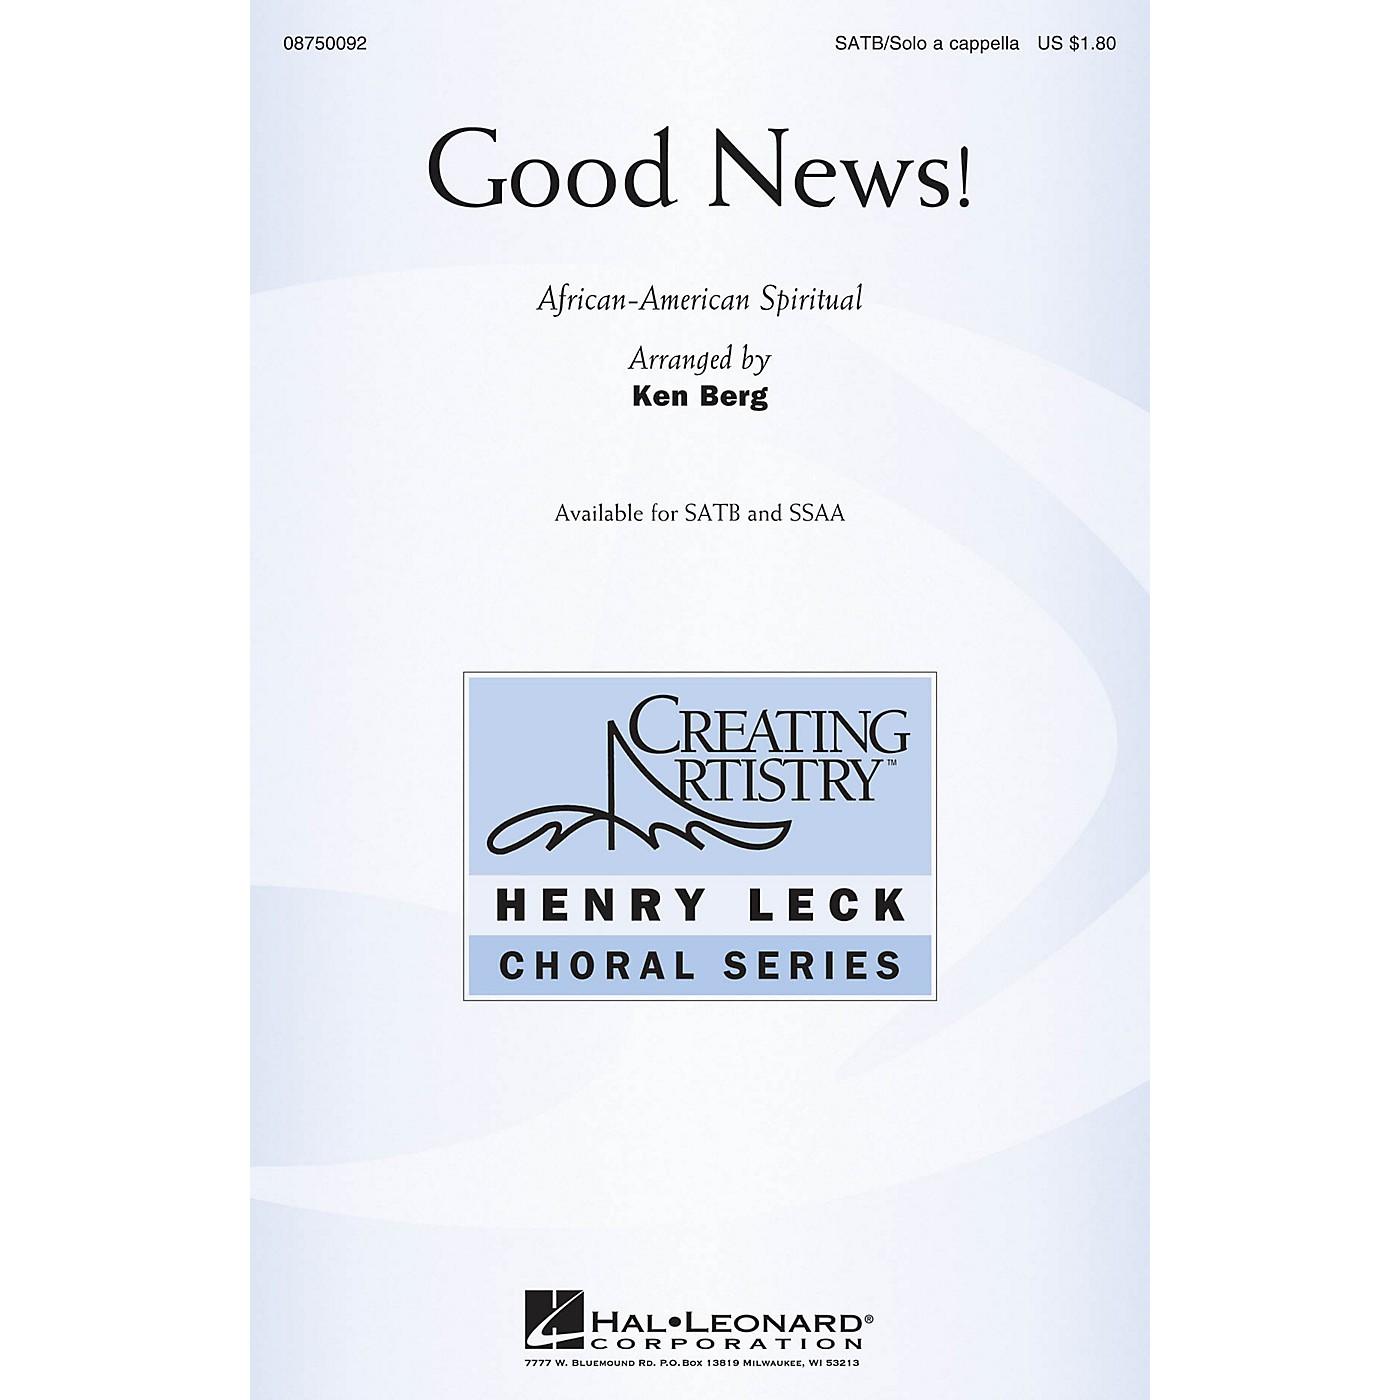 Hal Leonard Good News! SATB and Solo A Cappella arranged by Ken Berg thumbnail